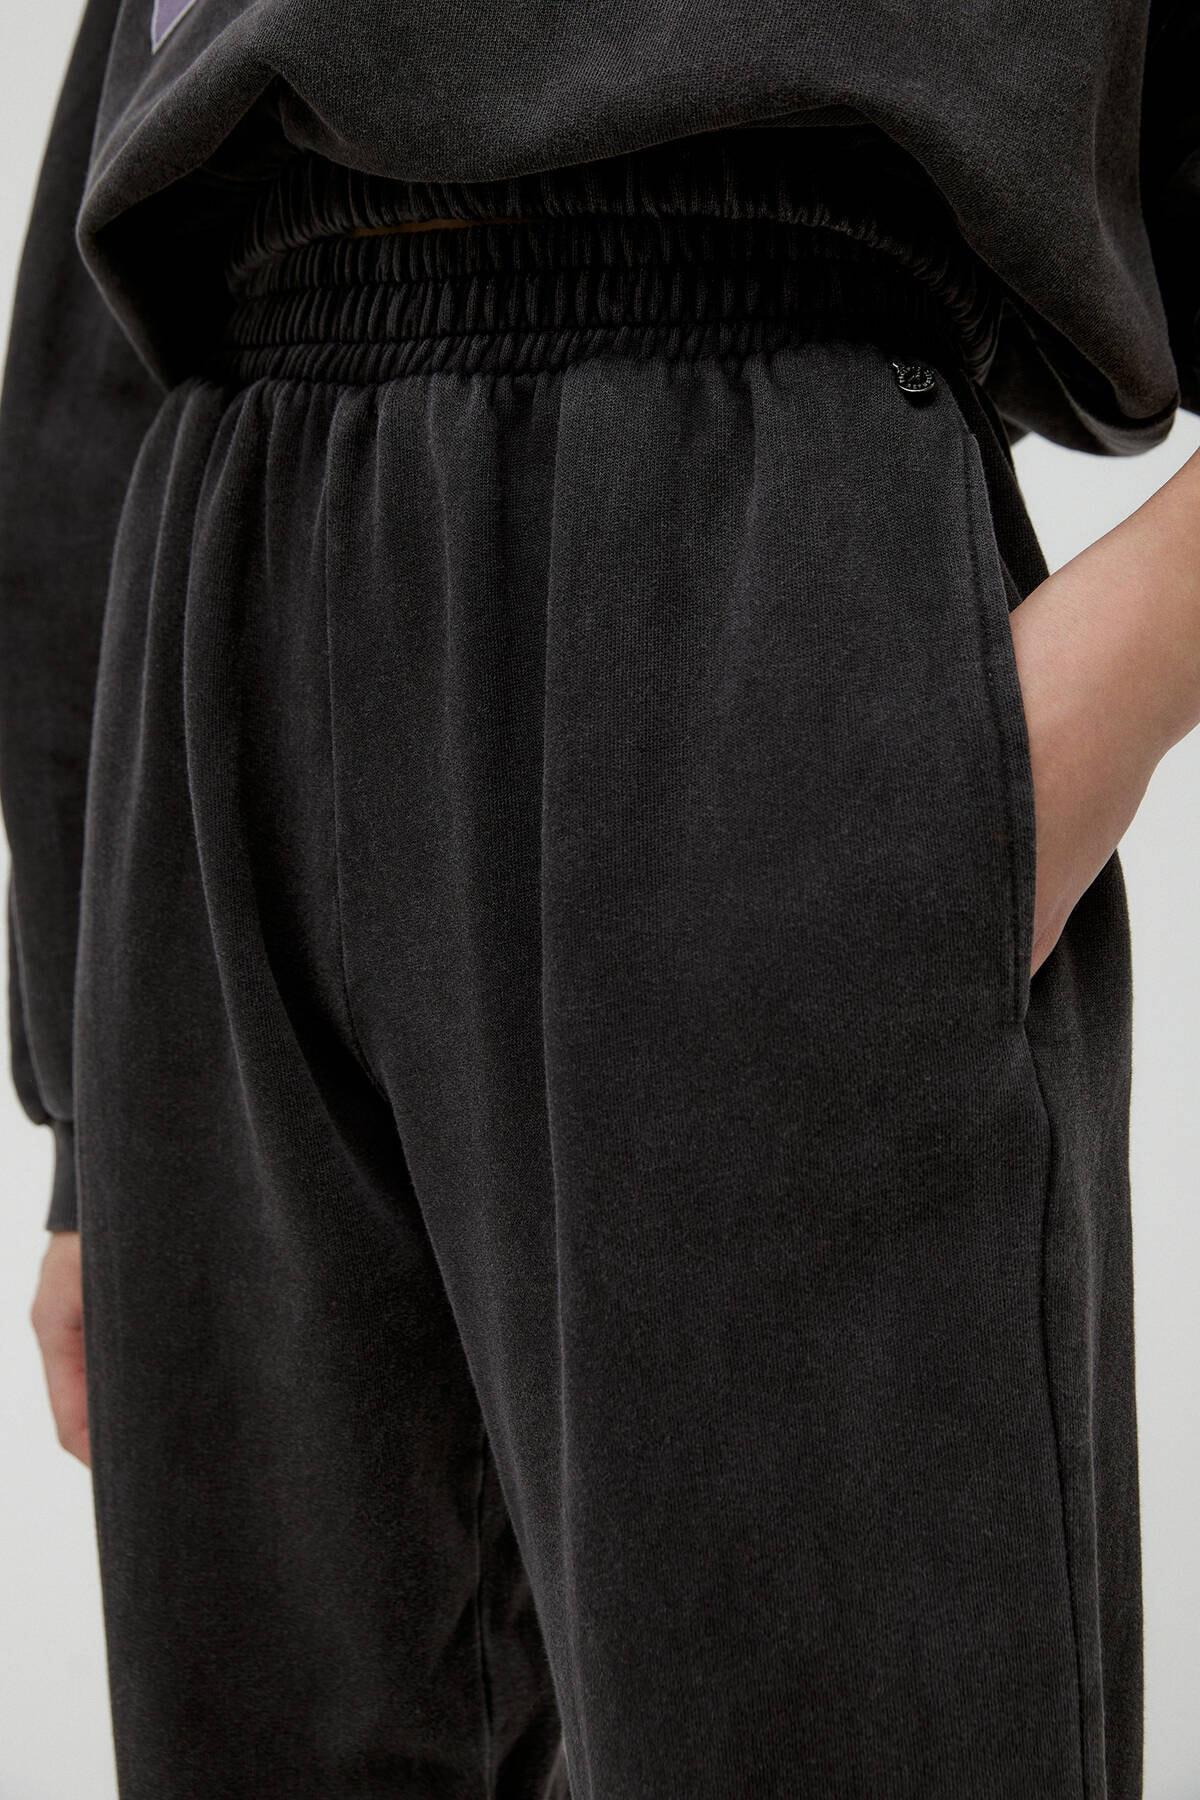 Pull & Bear Kadın Soluk Siyah Miami Sloganlı Jogging Fit Pantolon 04677303 4